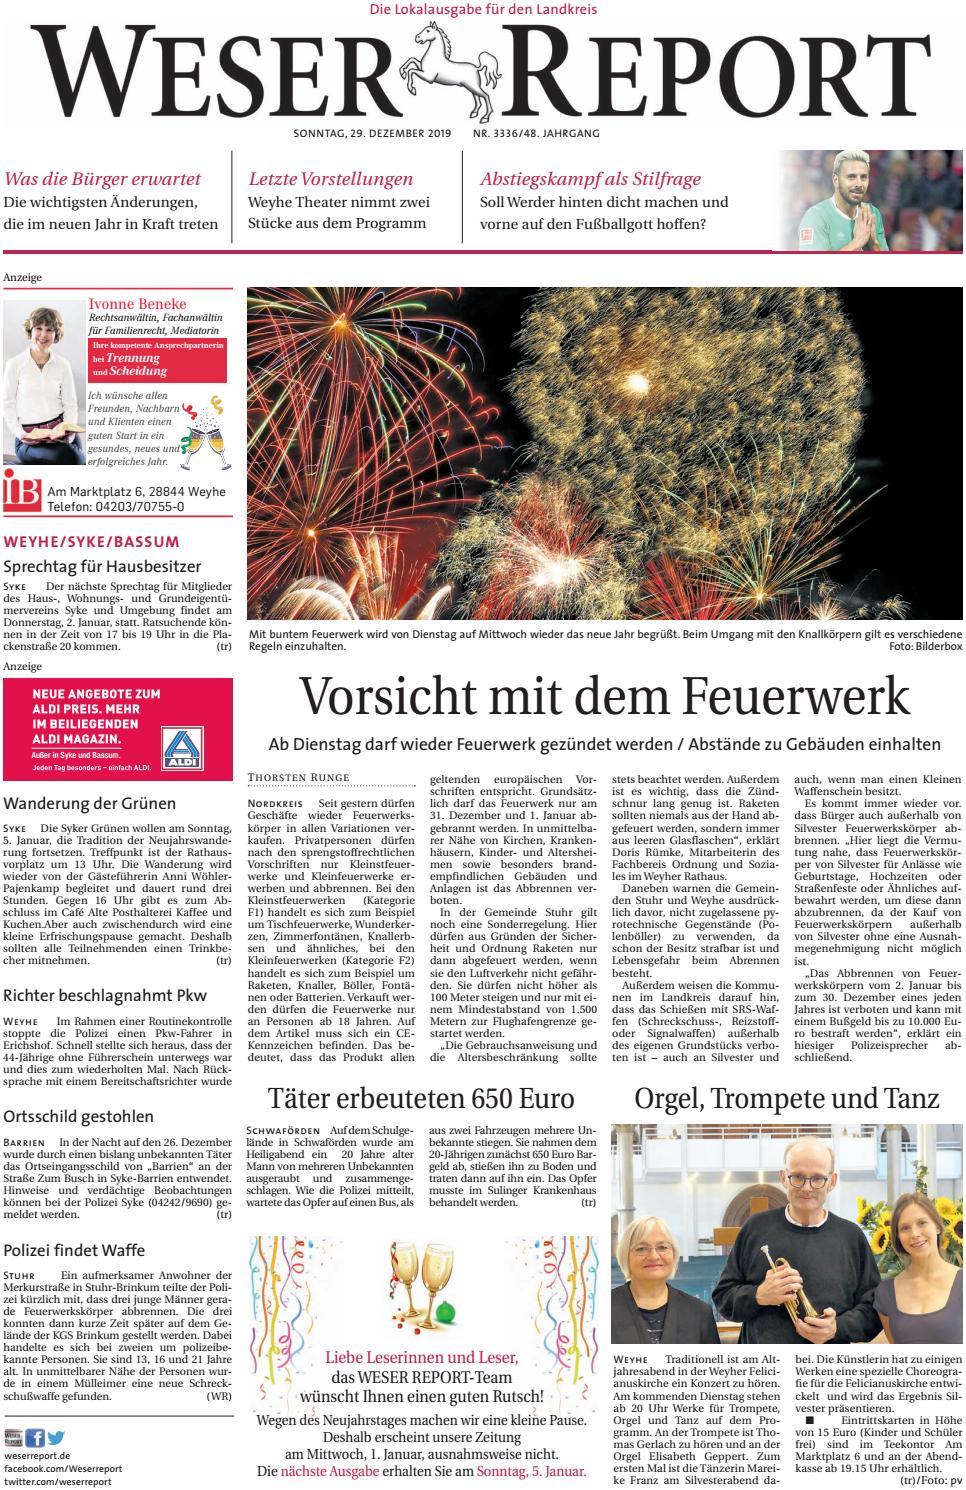 Weser Report Weyhe Syke Bassum Vom 29 12 2019 By Kps